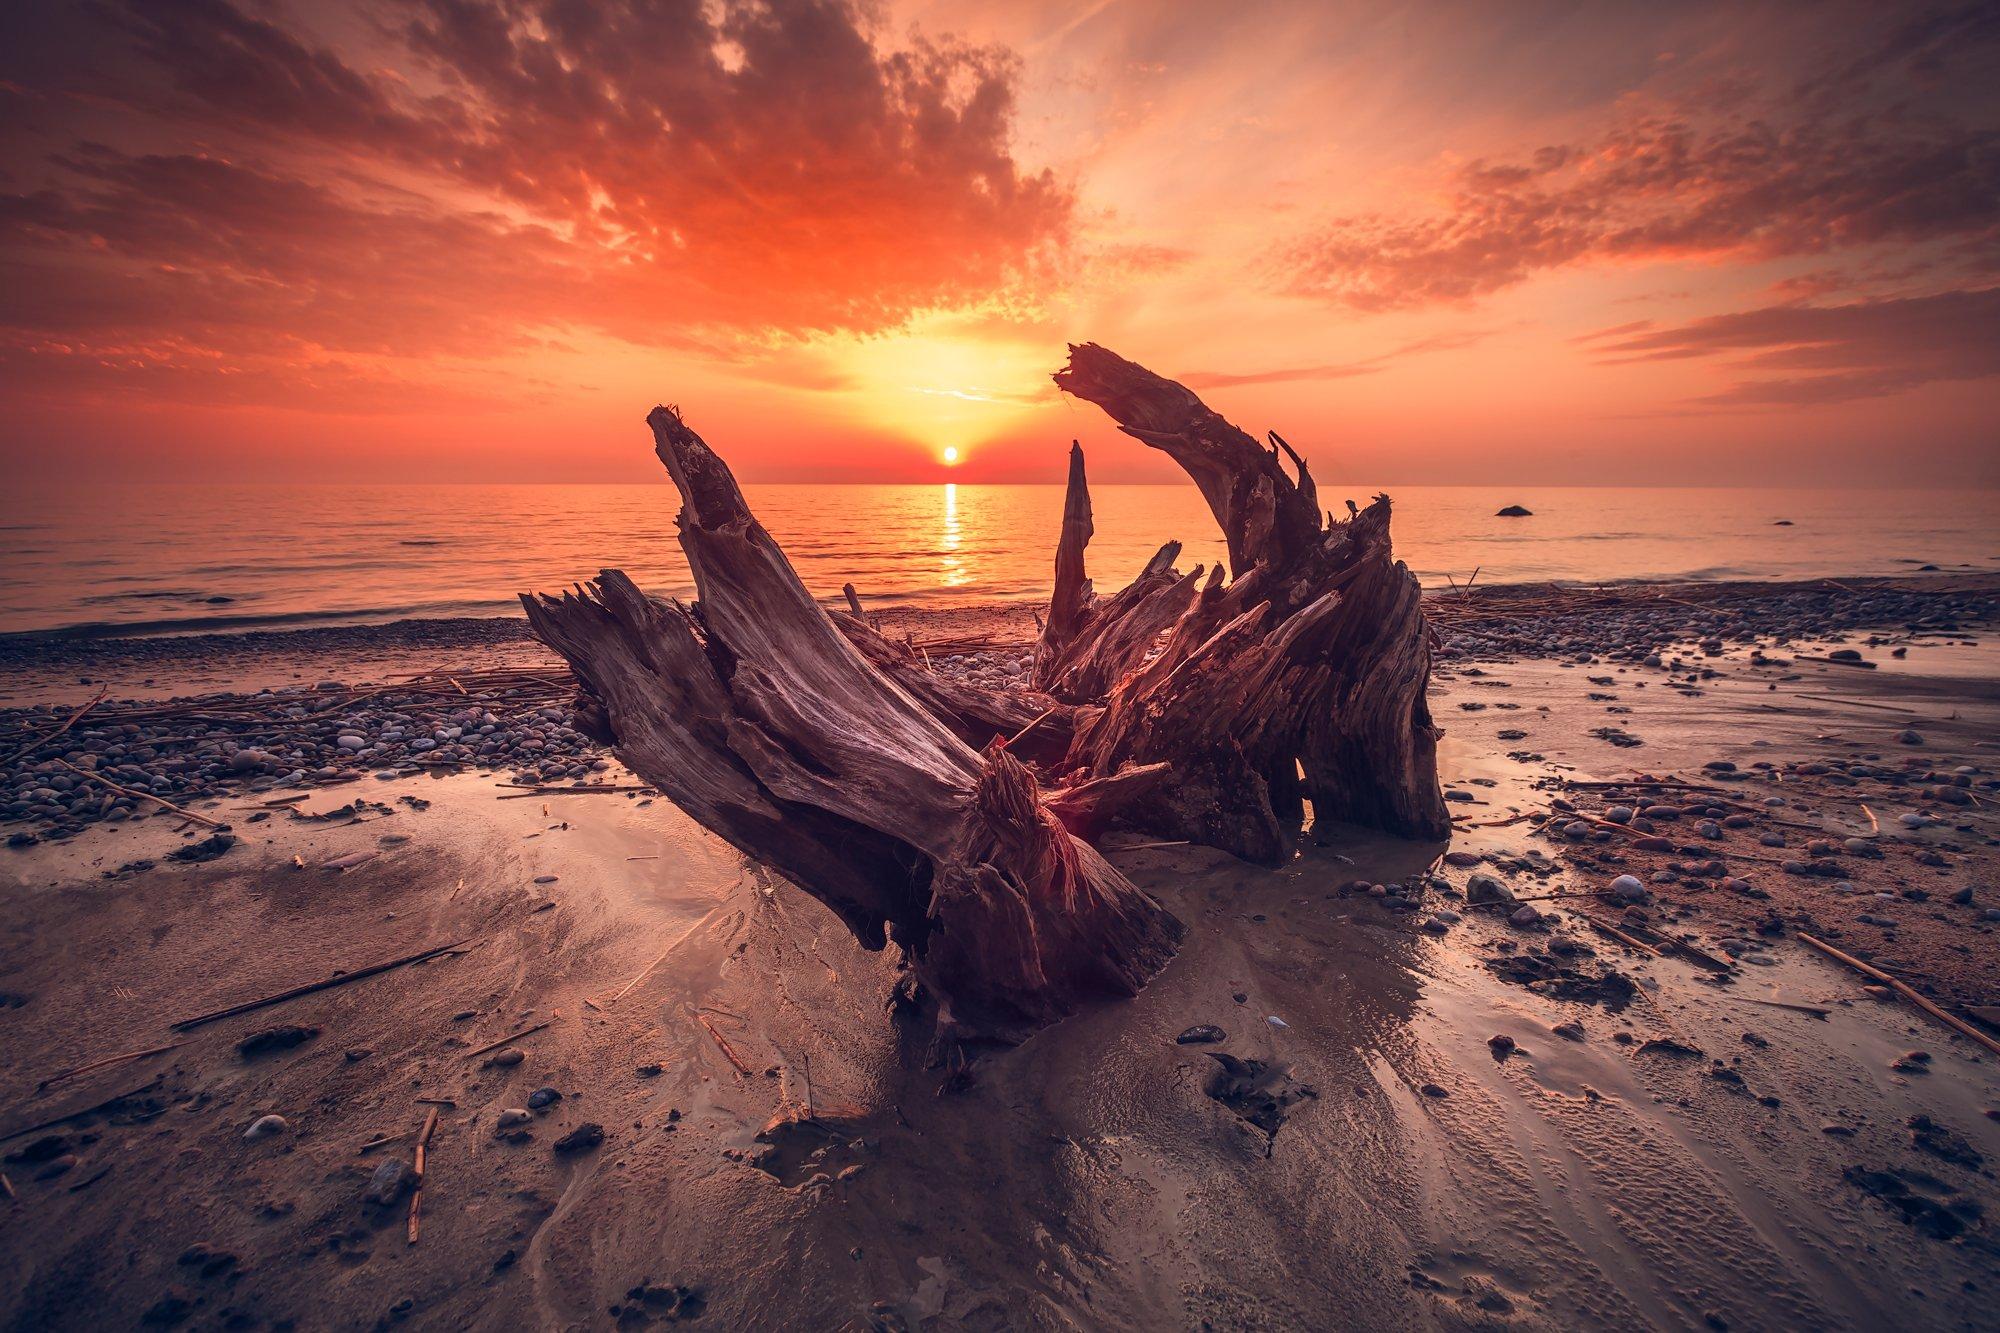 seascape, sunset, baltic sea, colors, Руслан Болгов (Axe)